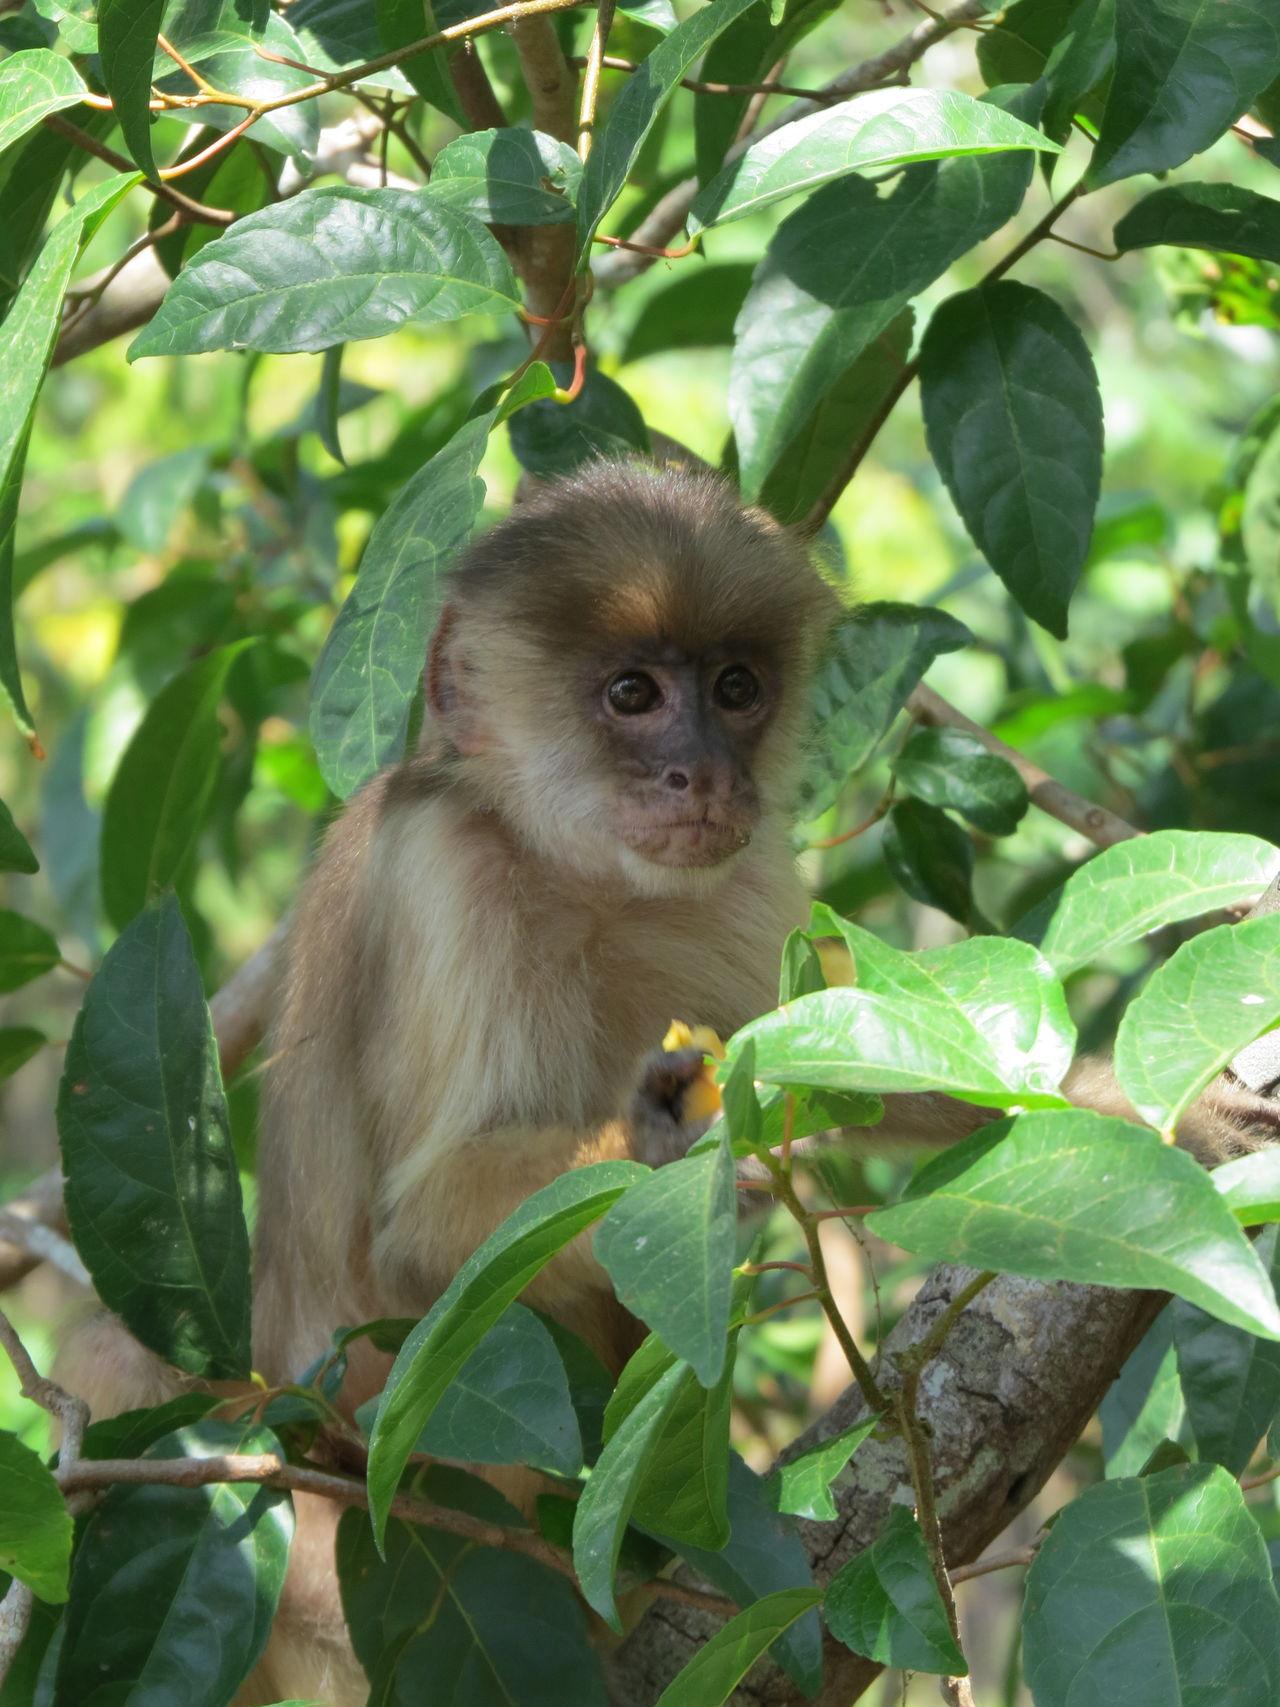 Amazon Amazon Monkey Amazon River Amazonas Animals In The Wild Beauty In Nature Mammal Monkey Nature At Its Best Nature Up Close One Animal Travel The World